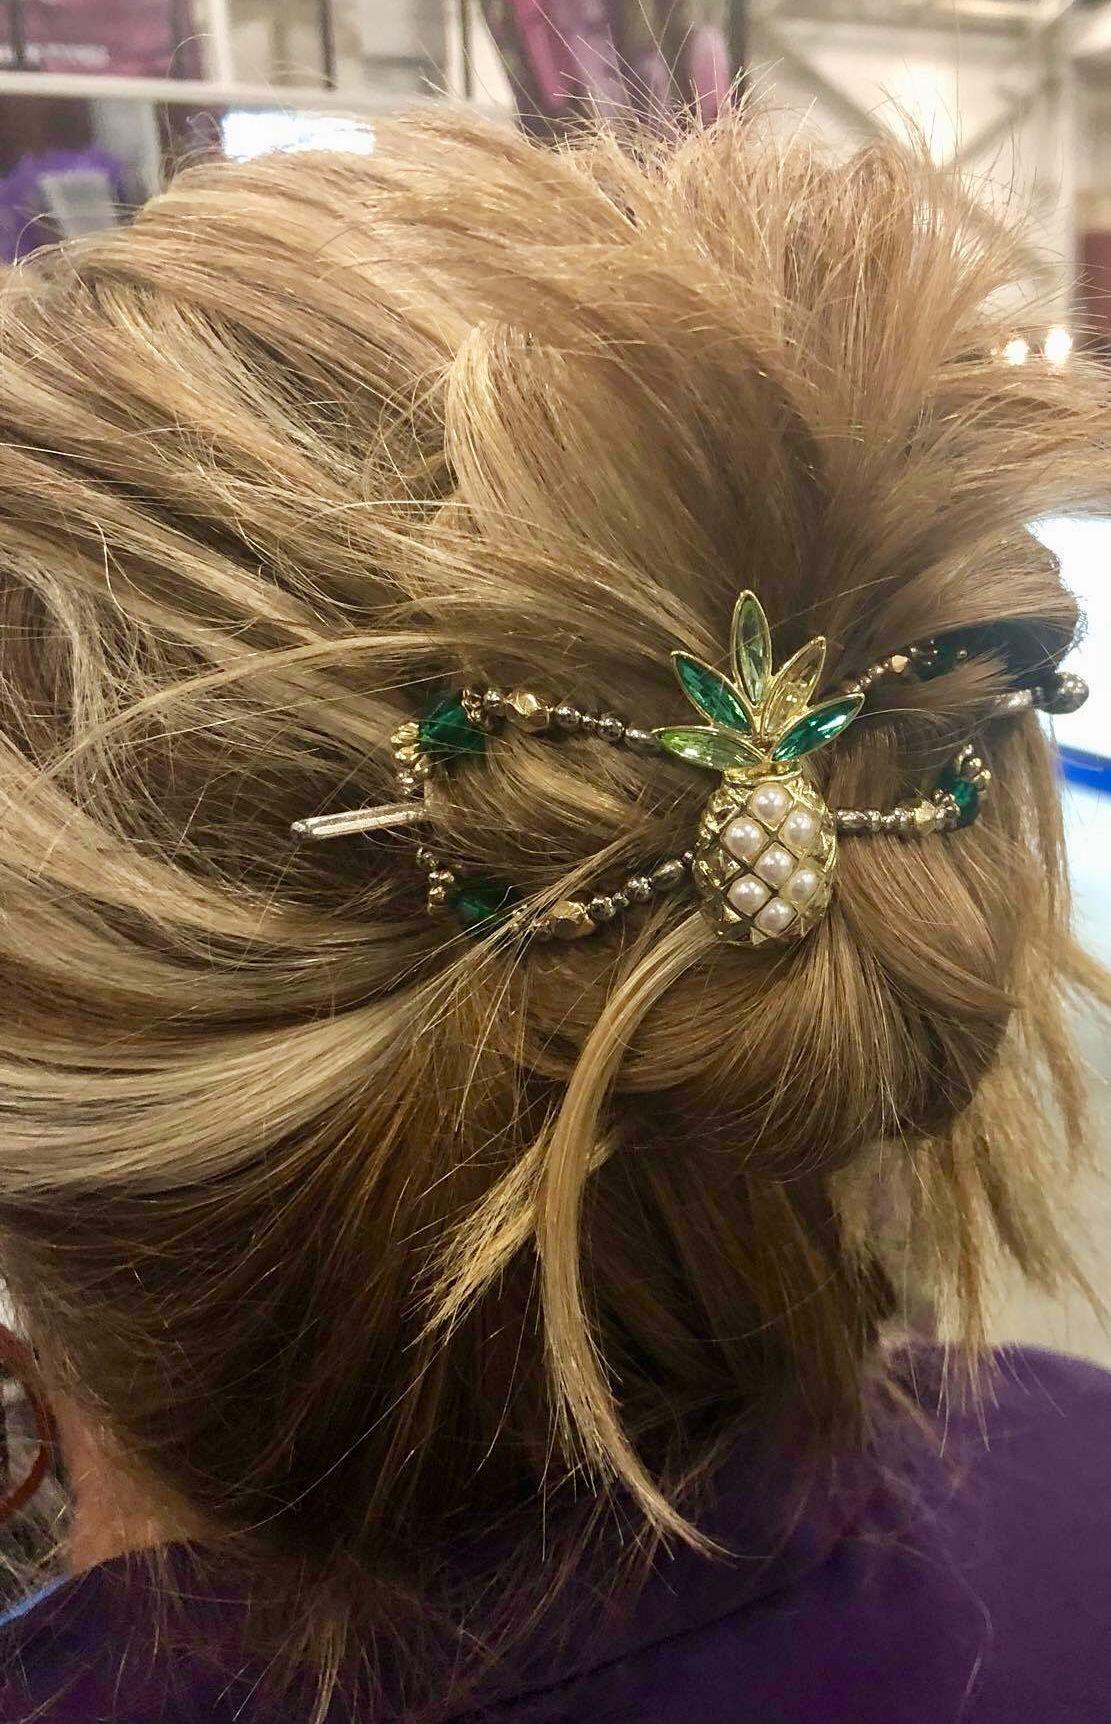 Piña the fun pineapple flexi clip easy hairstyle ideas with